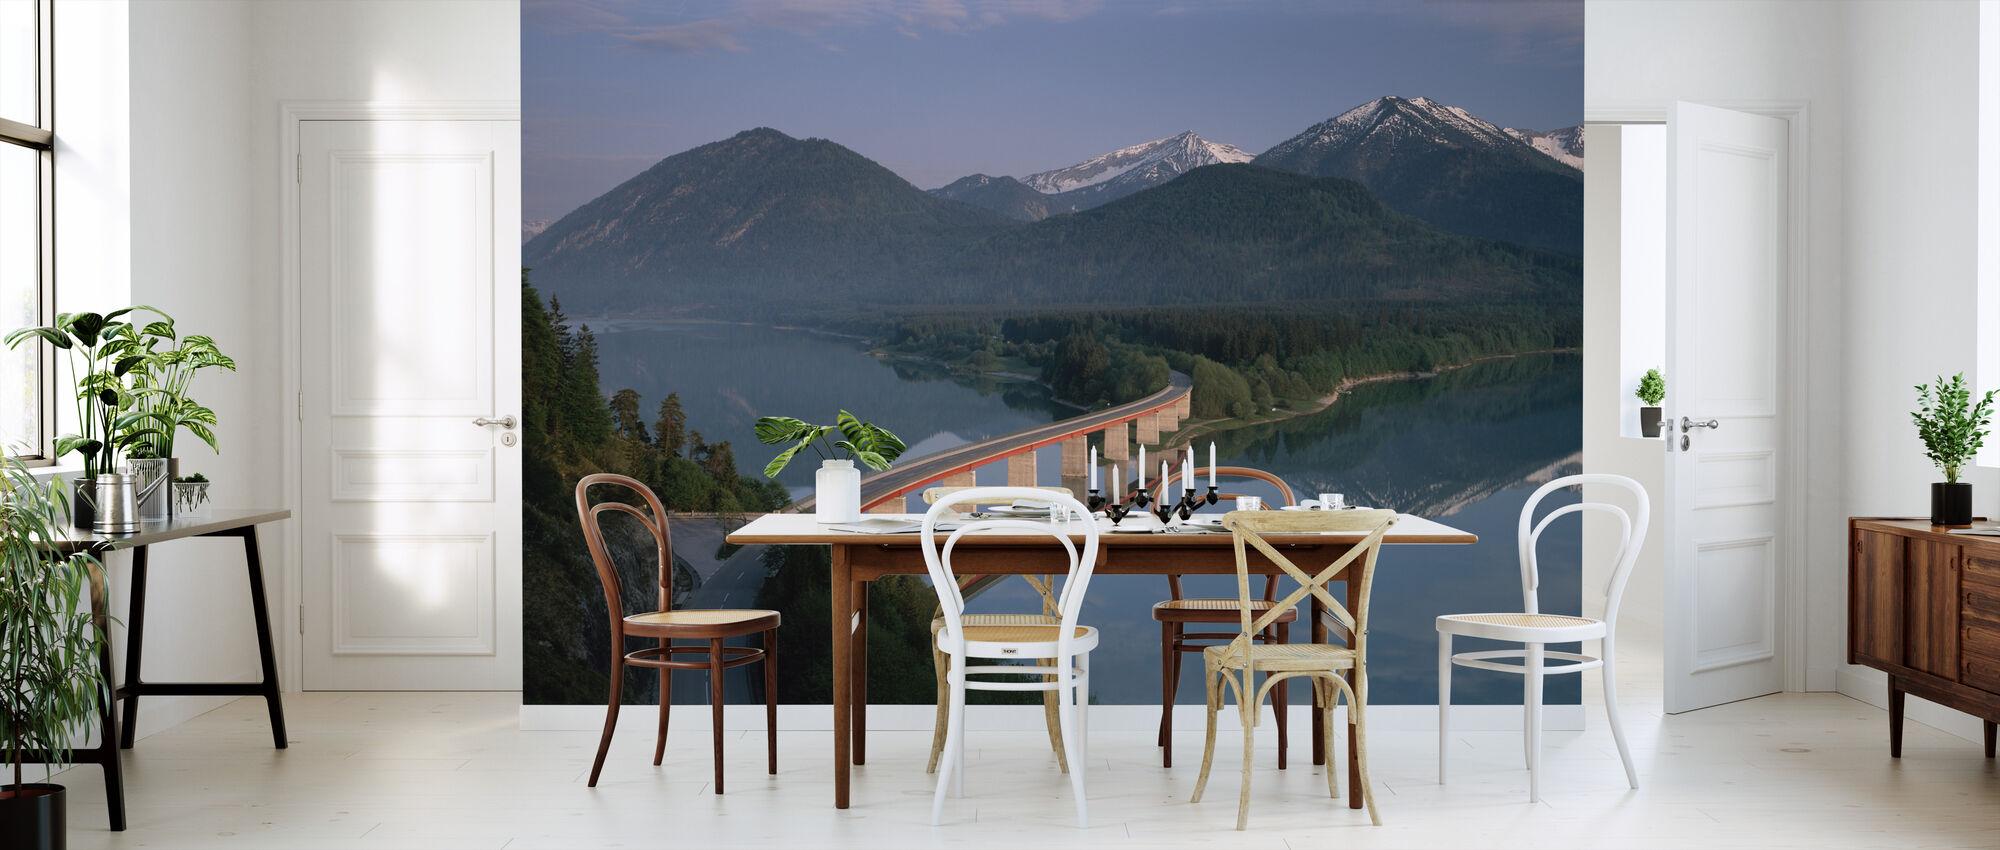 Bridge over Lake Sylvenstein - Wallpaper - Kitchen